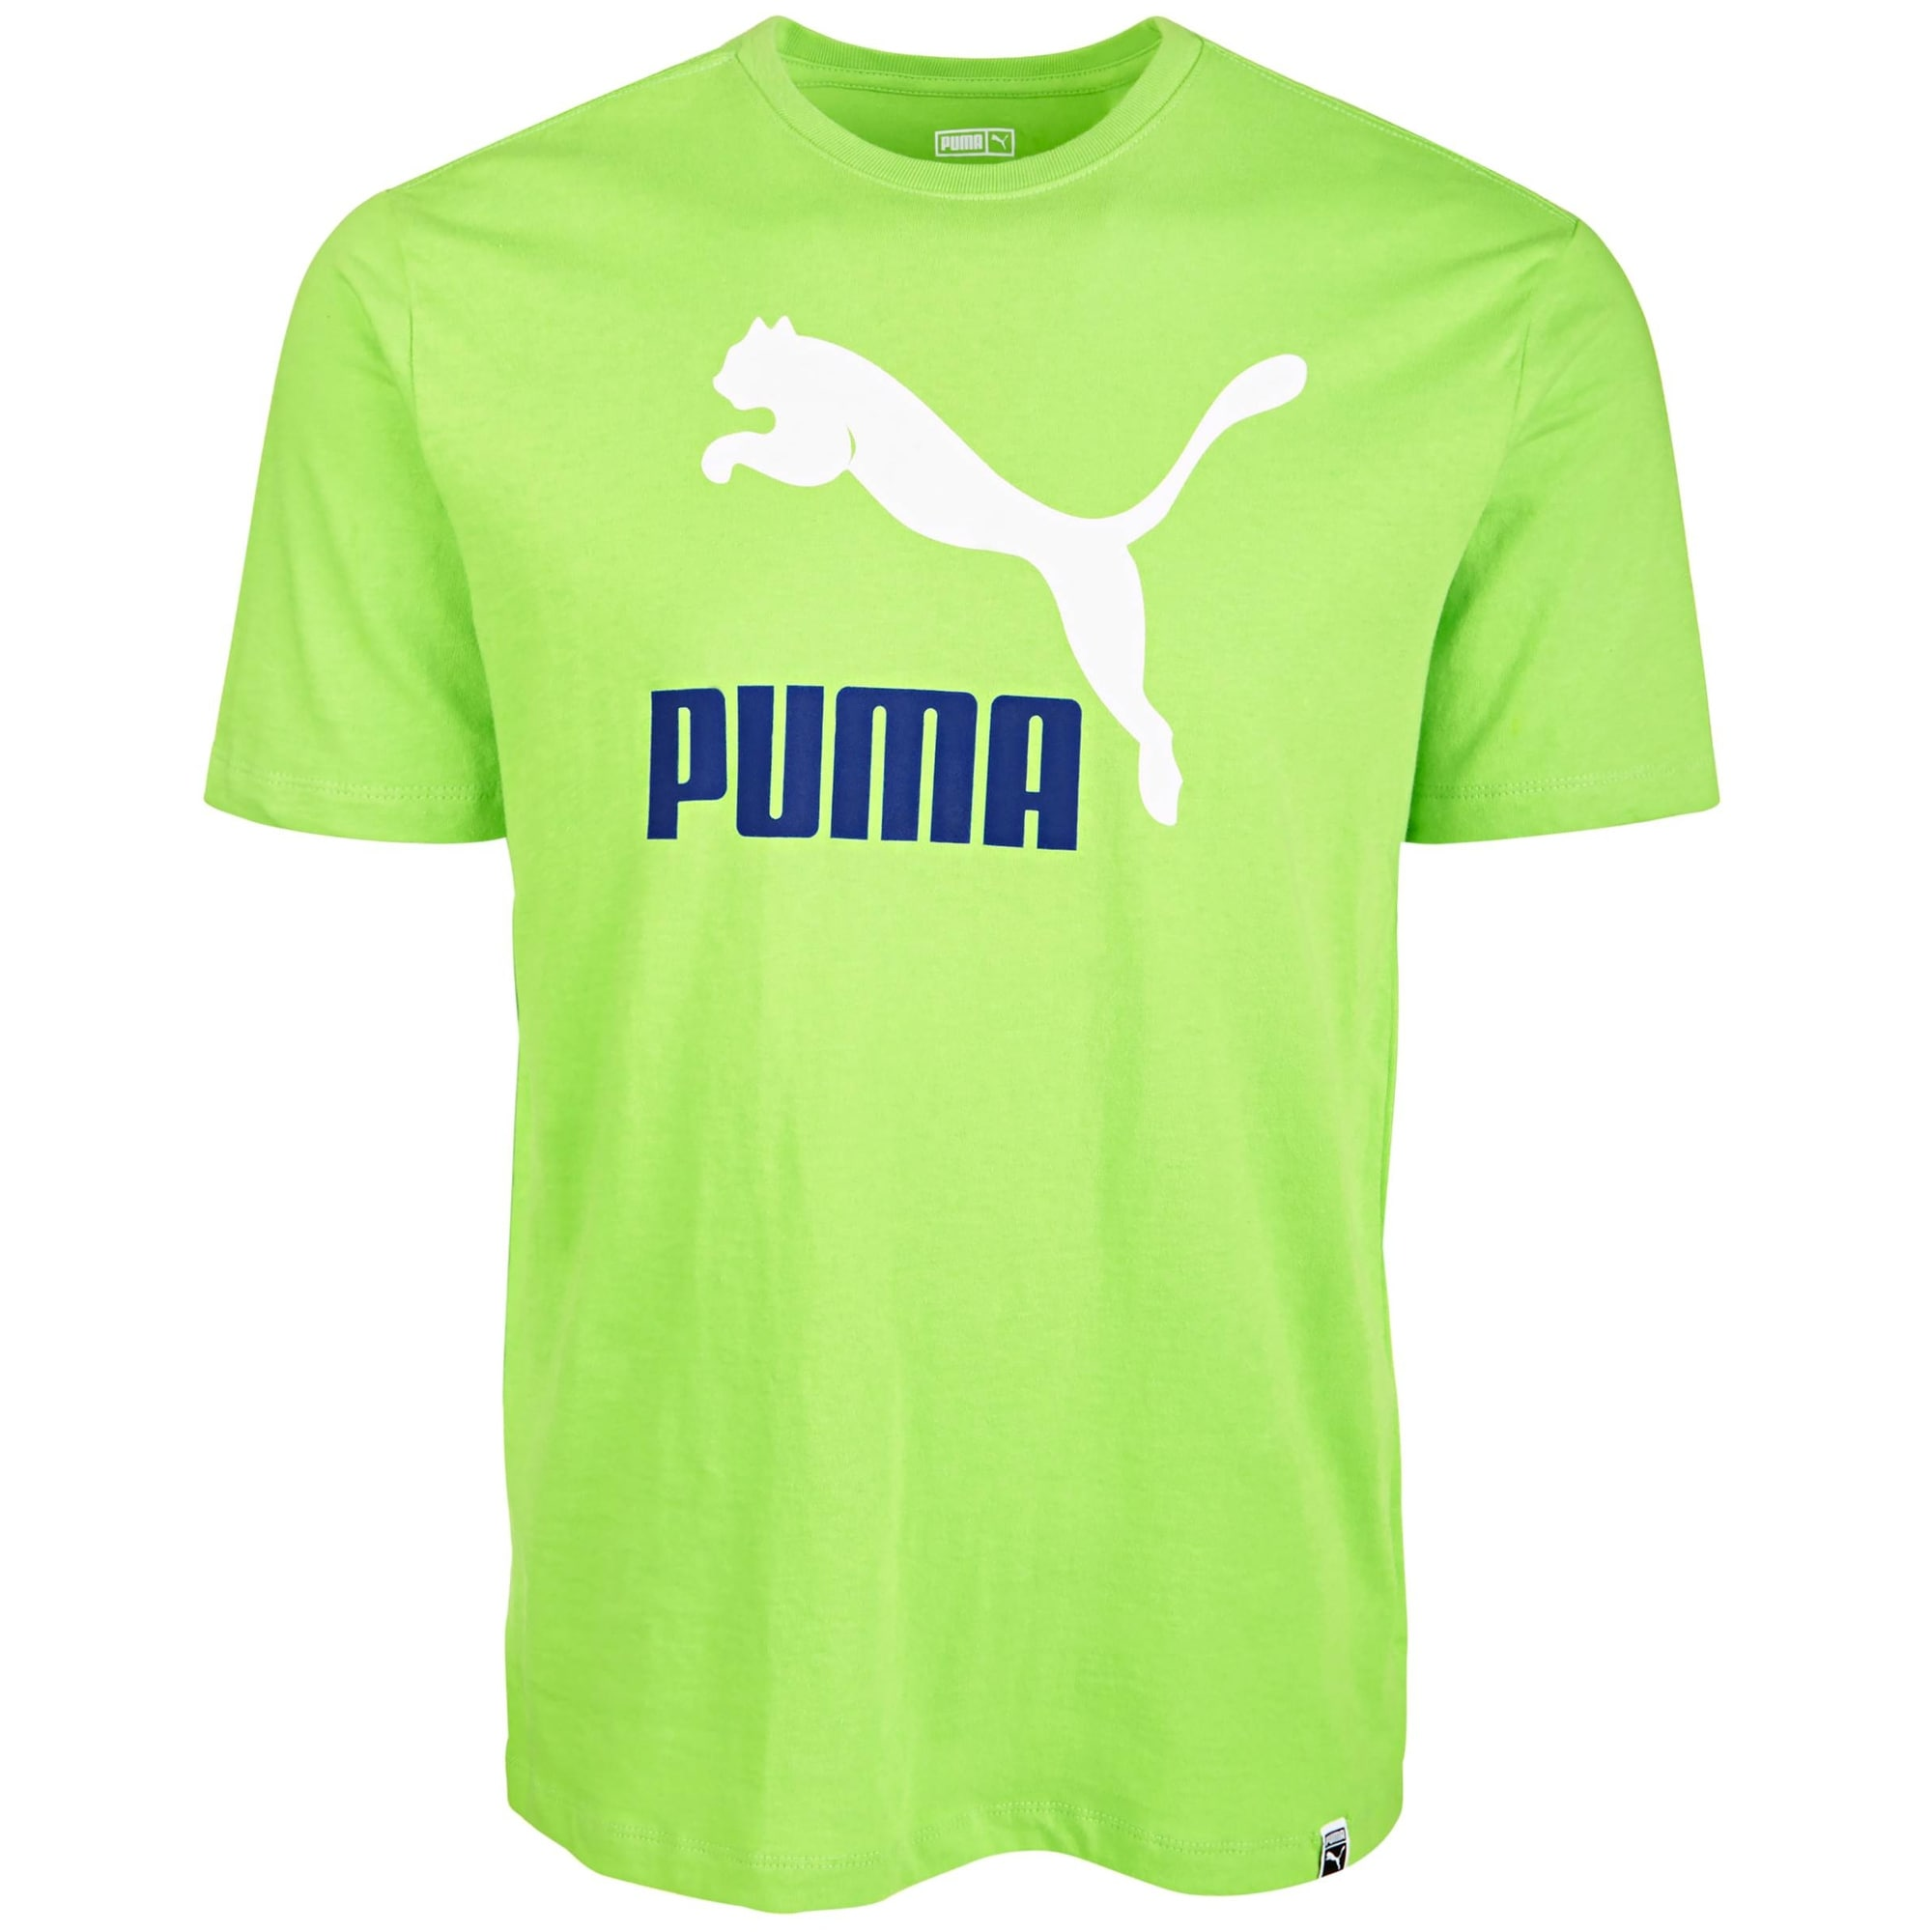 green and white puma shirt